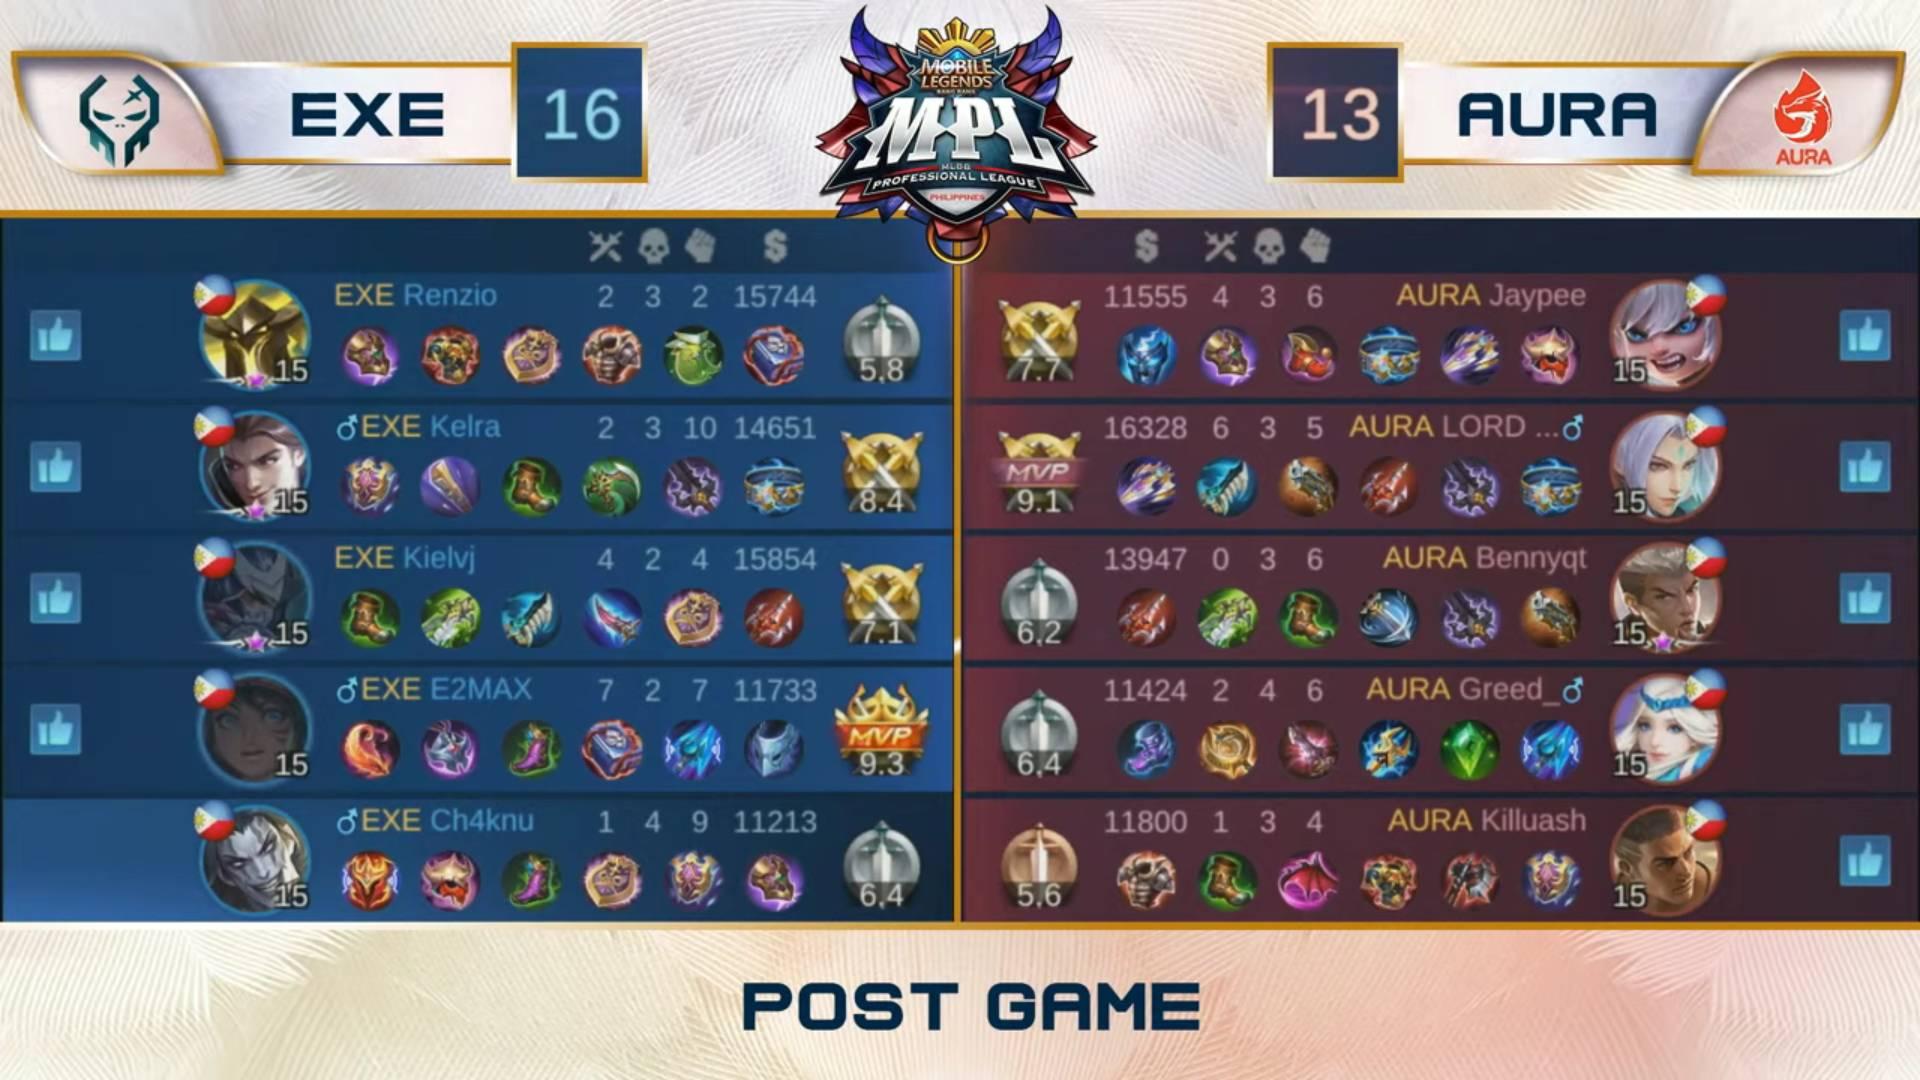 MPL-PH-Season-7-semis-Execration-def-Aura-PH-Game-1 Kielvj gets back at Aura PH as Execration ends MPL PH Finals drought ESports Mobile Legends MPL-PH News  - philippine sports news